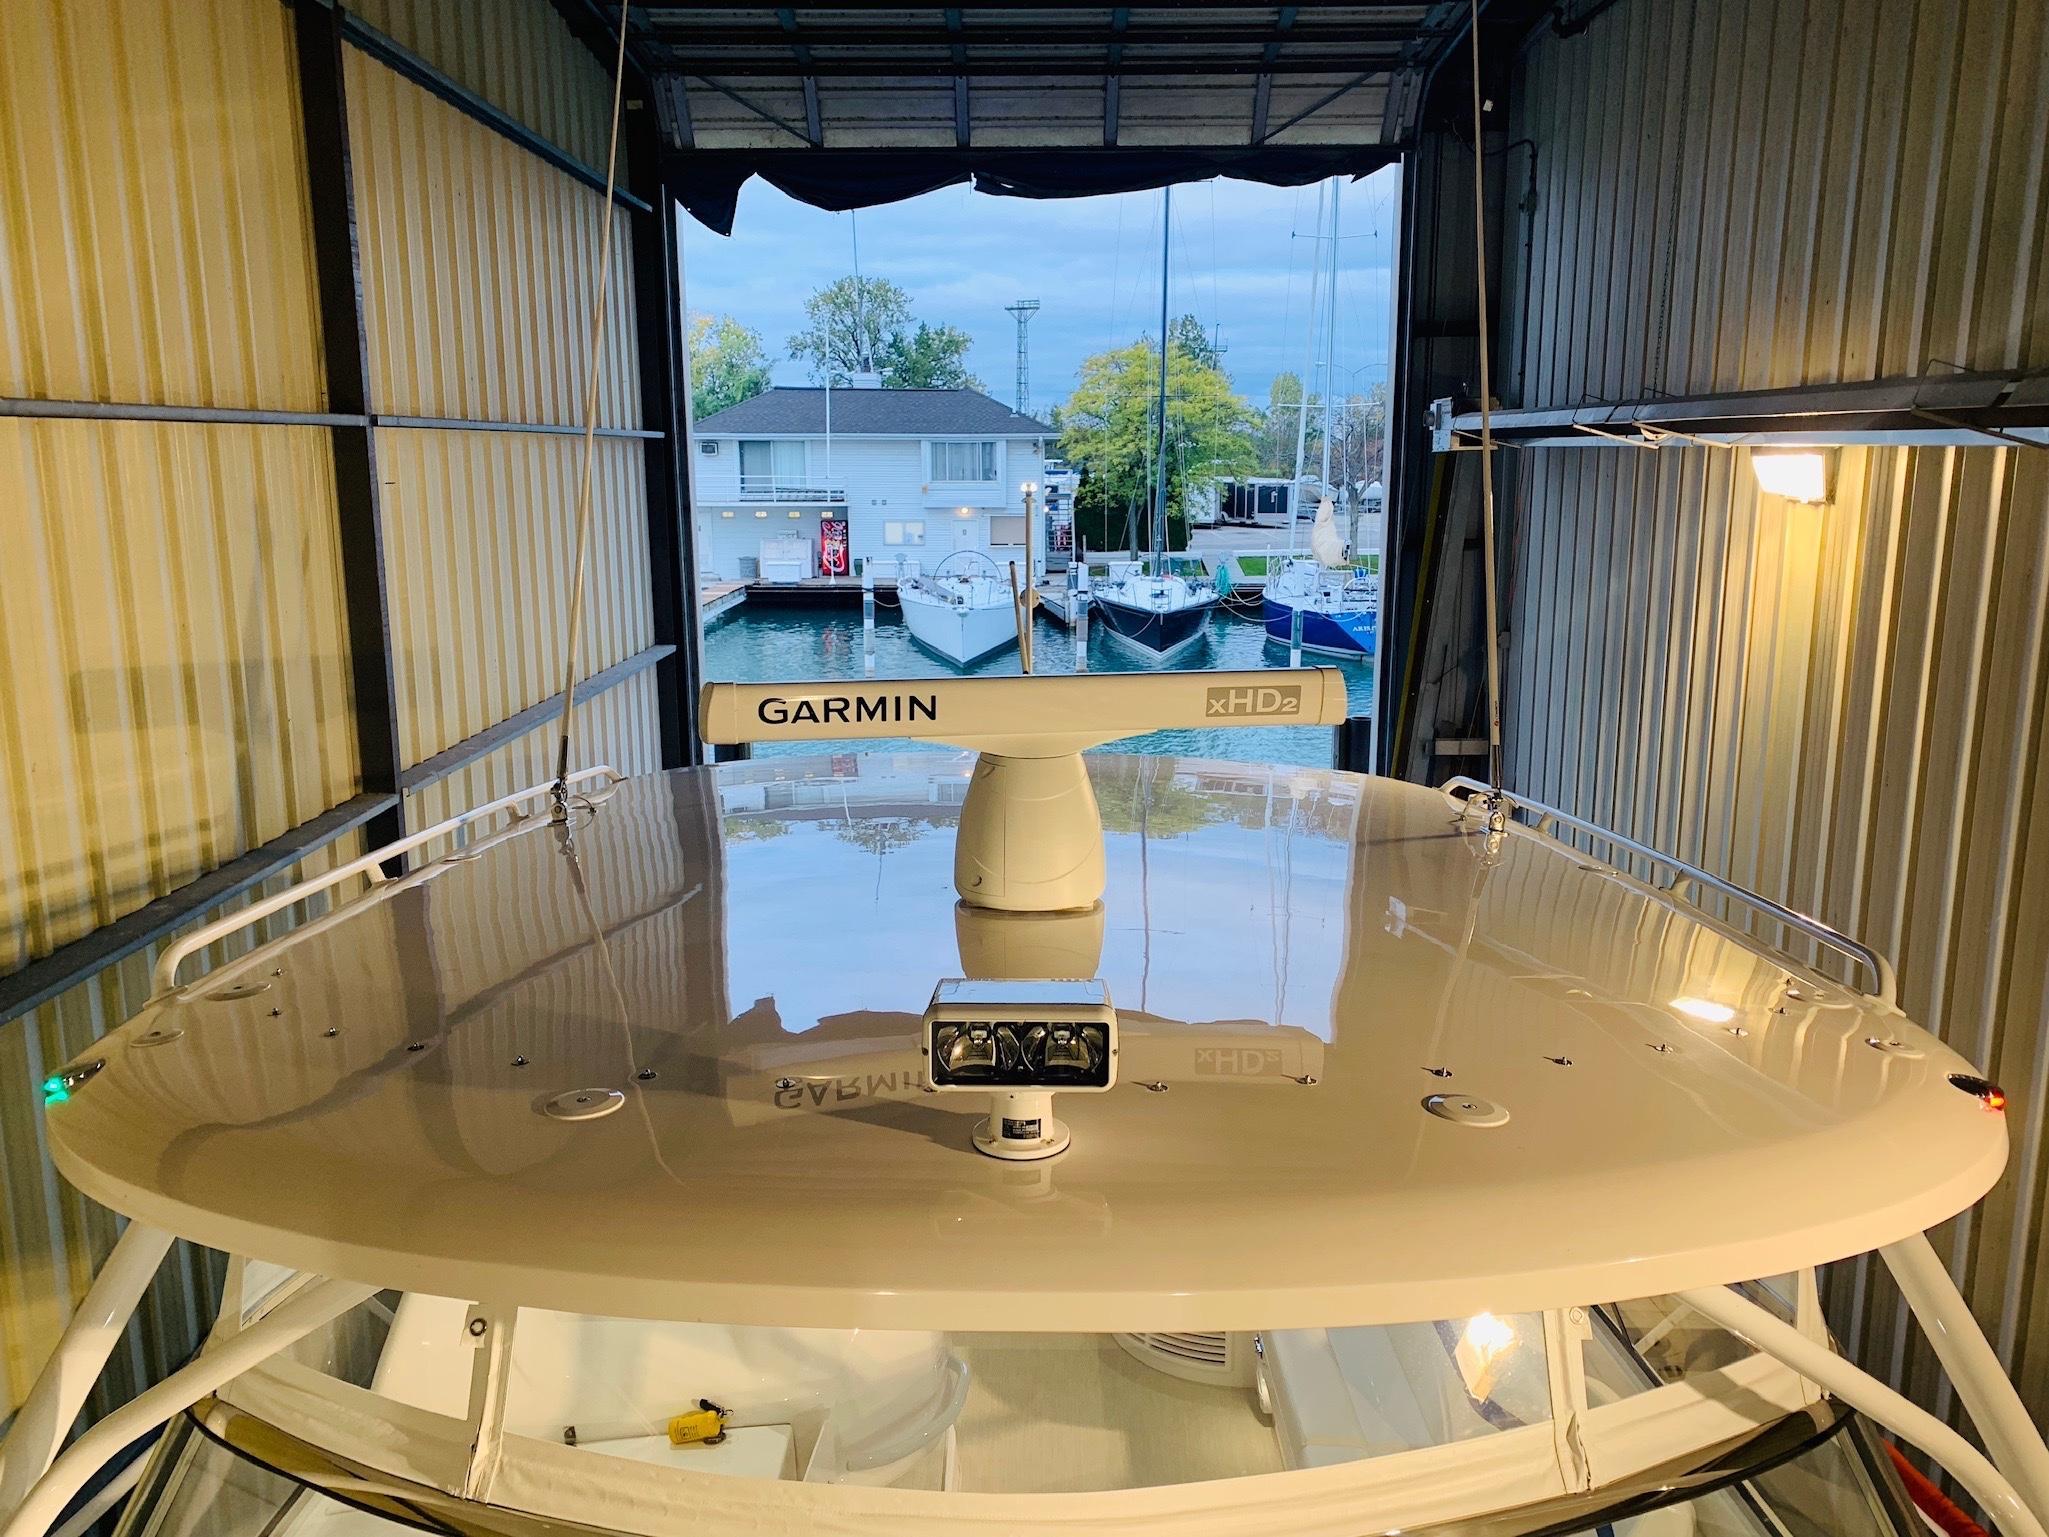 48 Intrepid Hard Top - Garmin HD Radar